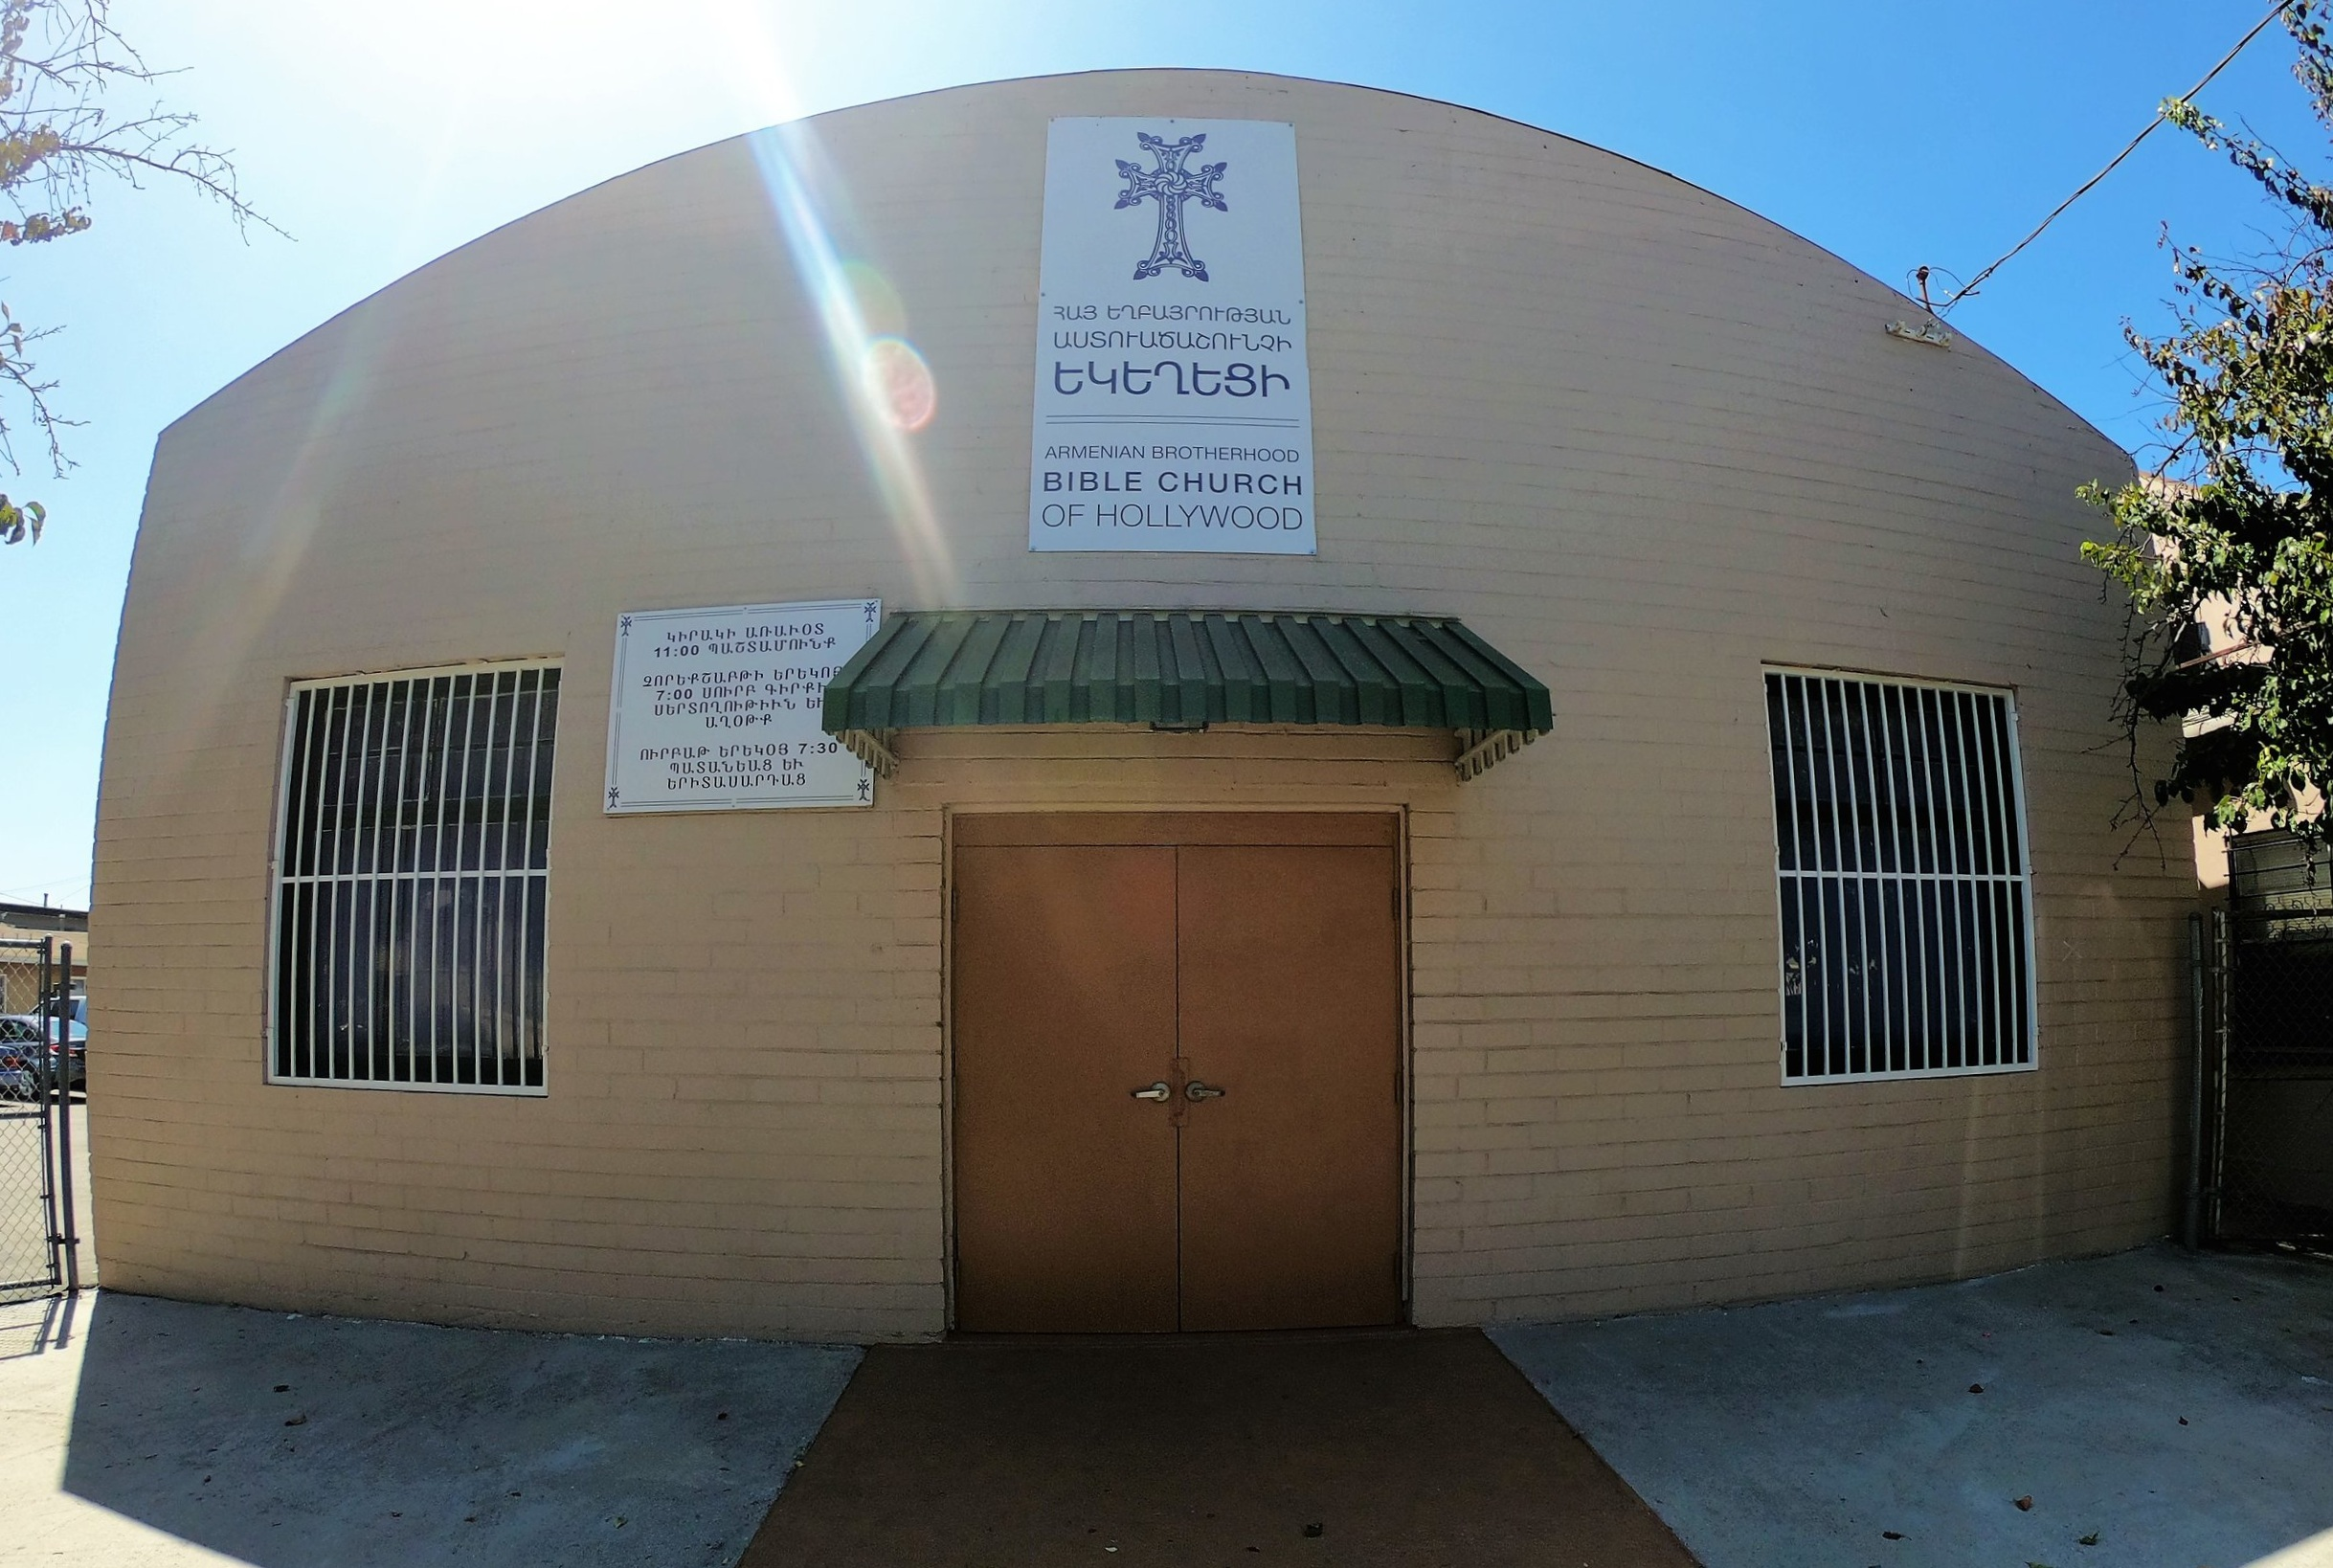 Armenian Brotherhood Bible Church in Hollywood, California